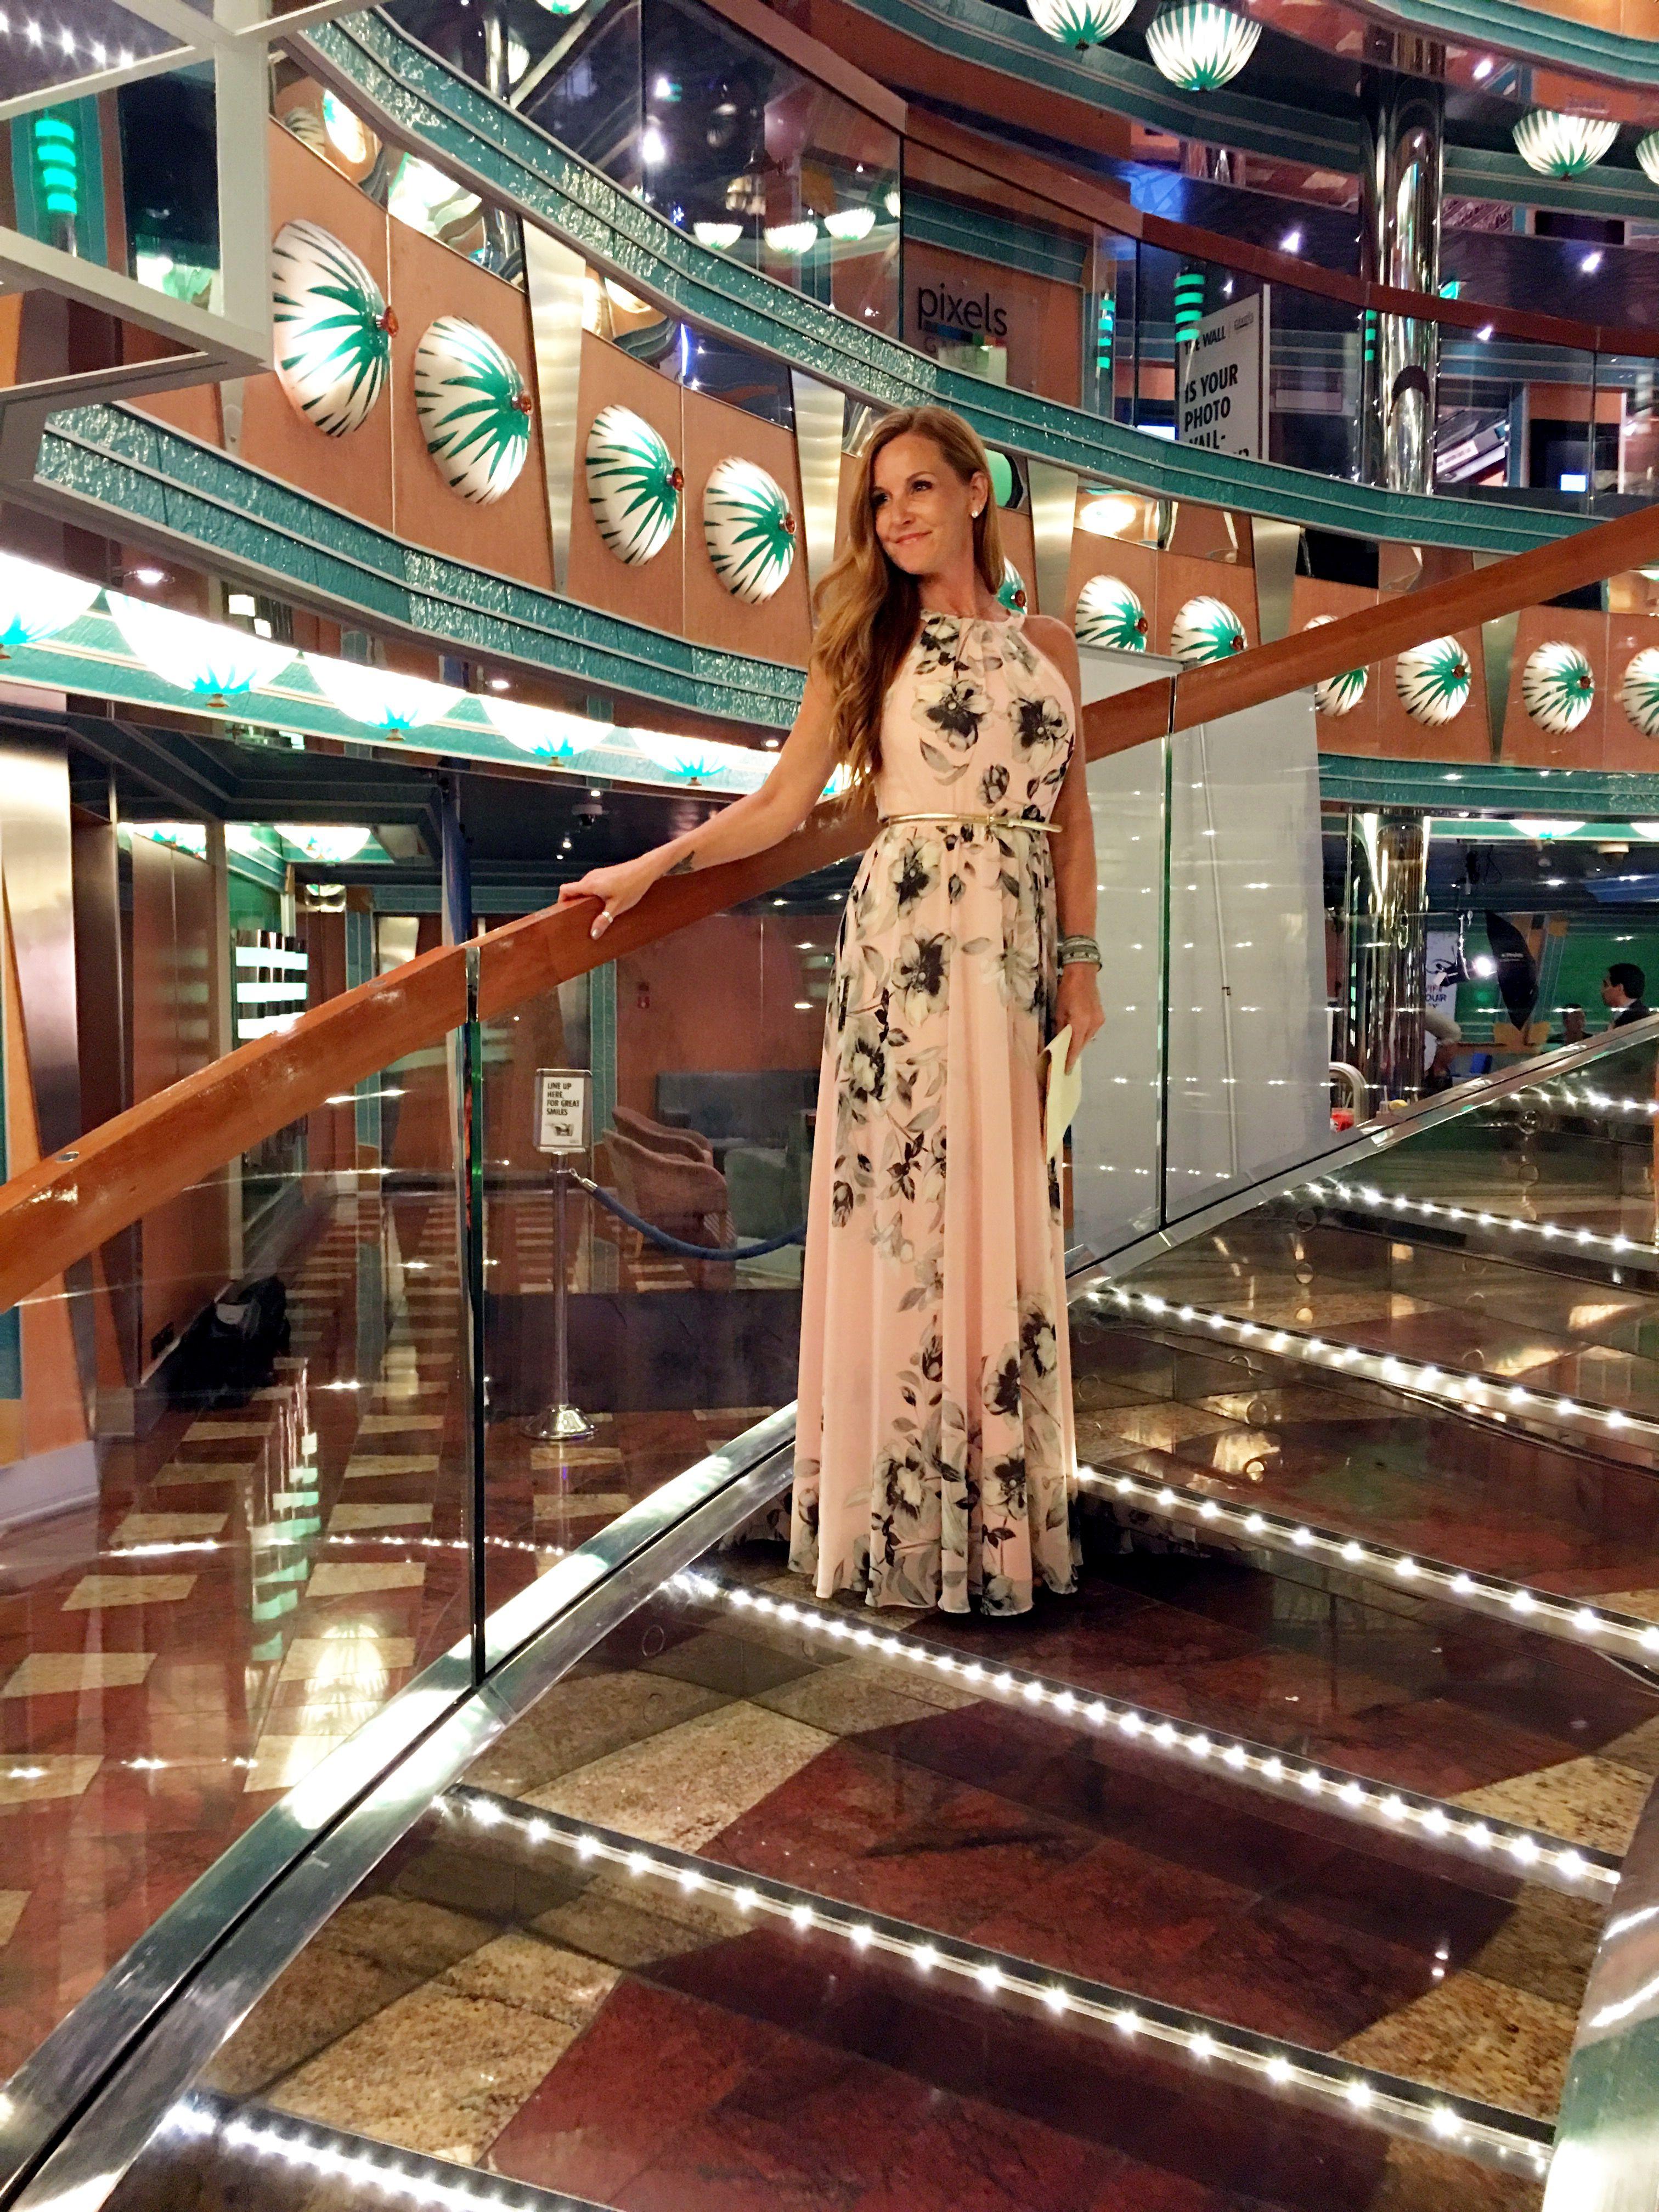 Carnival Cruise Formal Night Dress Code, Dress Code For Dining Room On Carnival Cruise